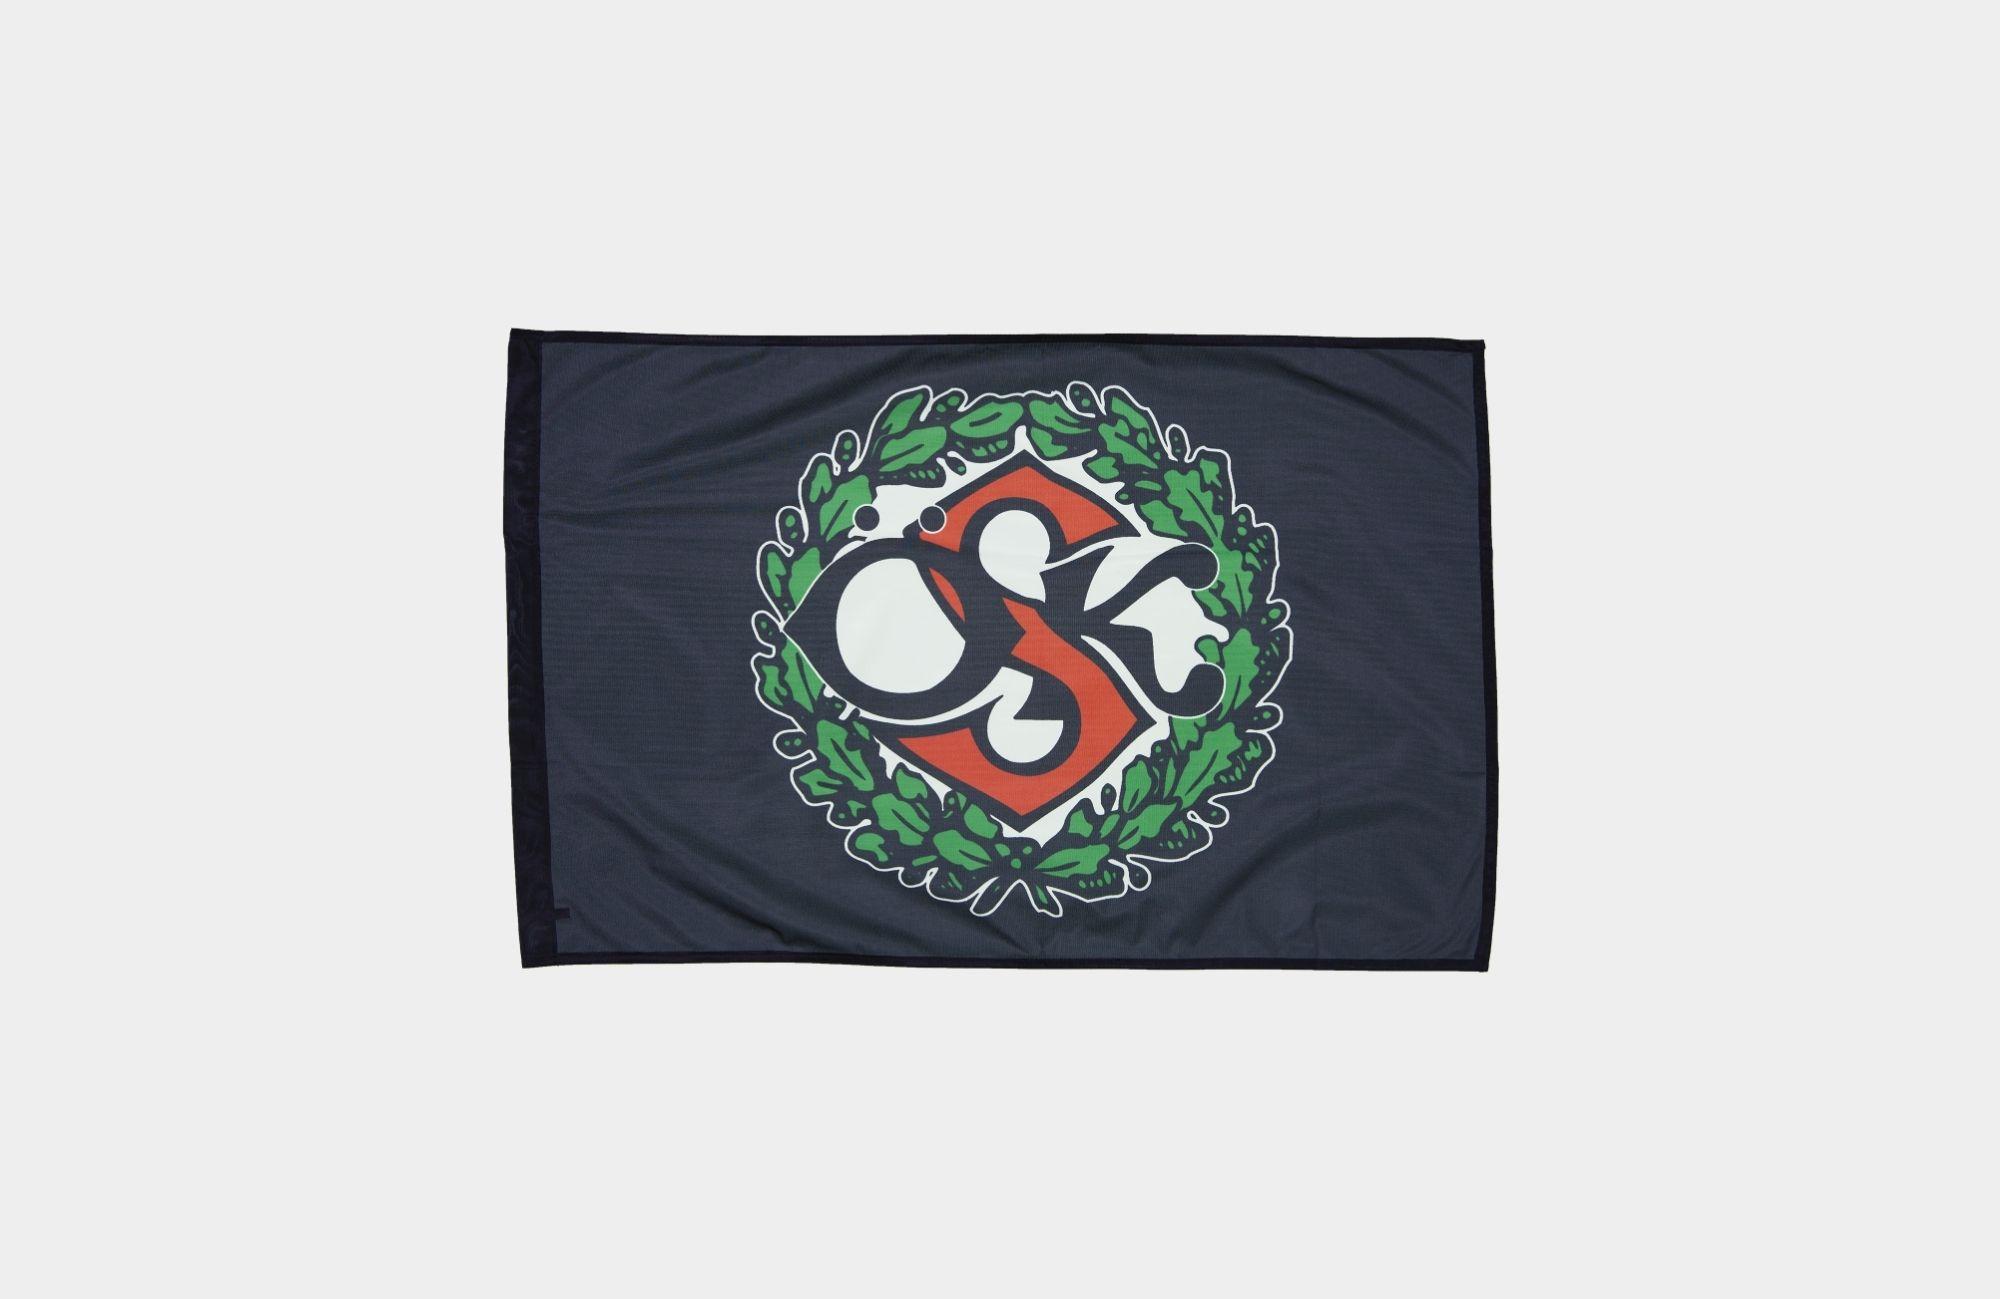 ösk flagga stor